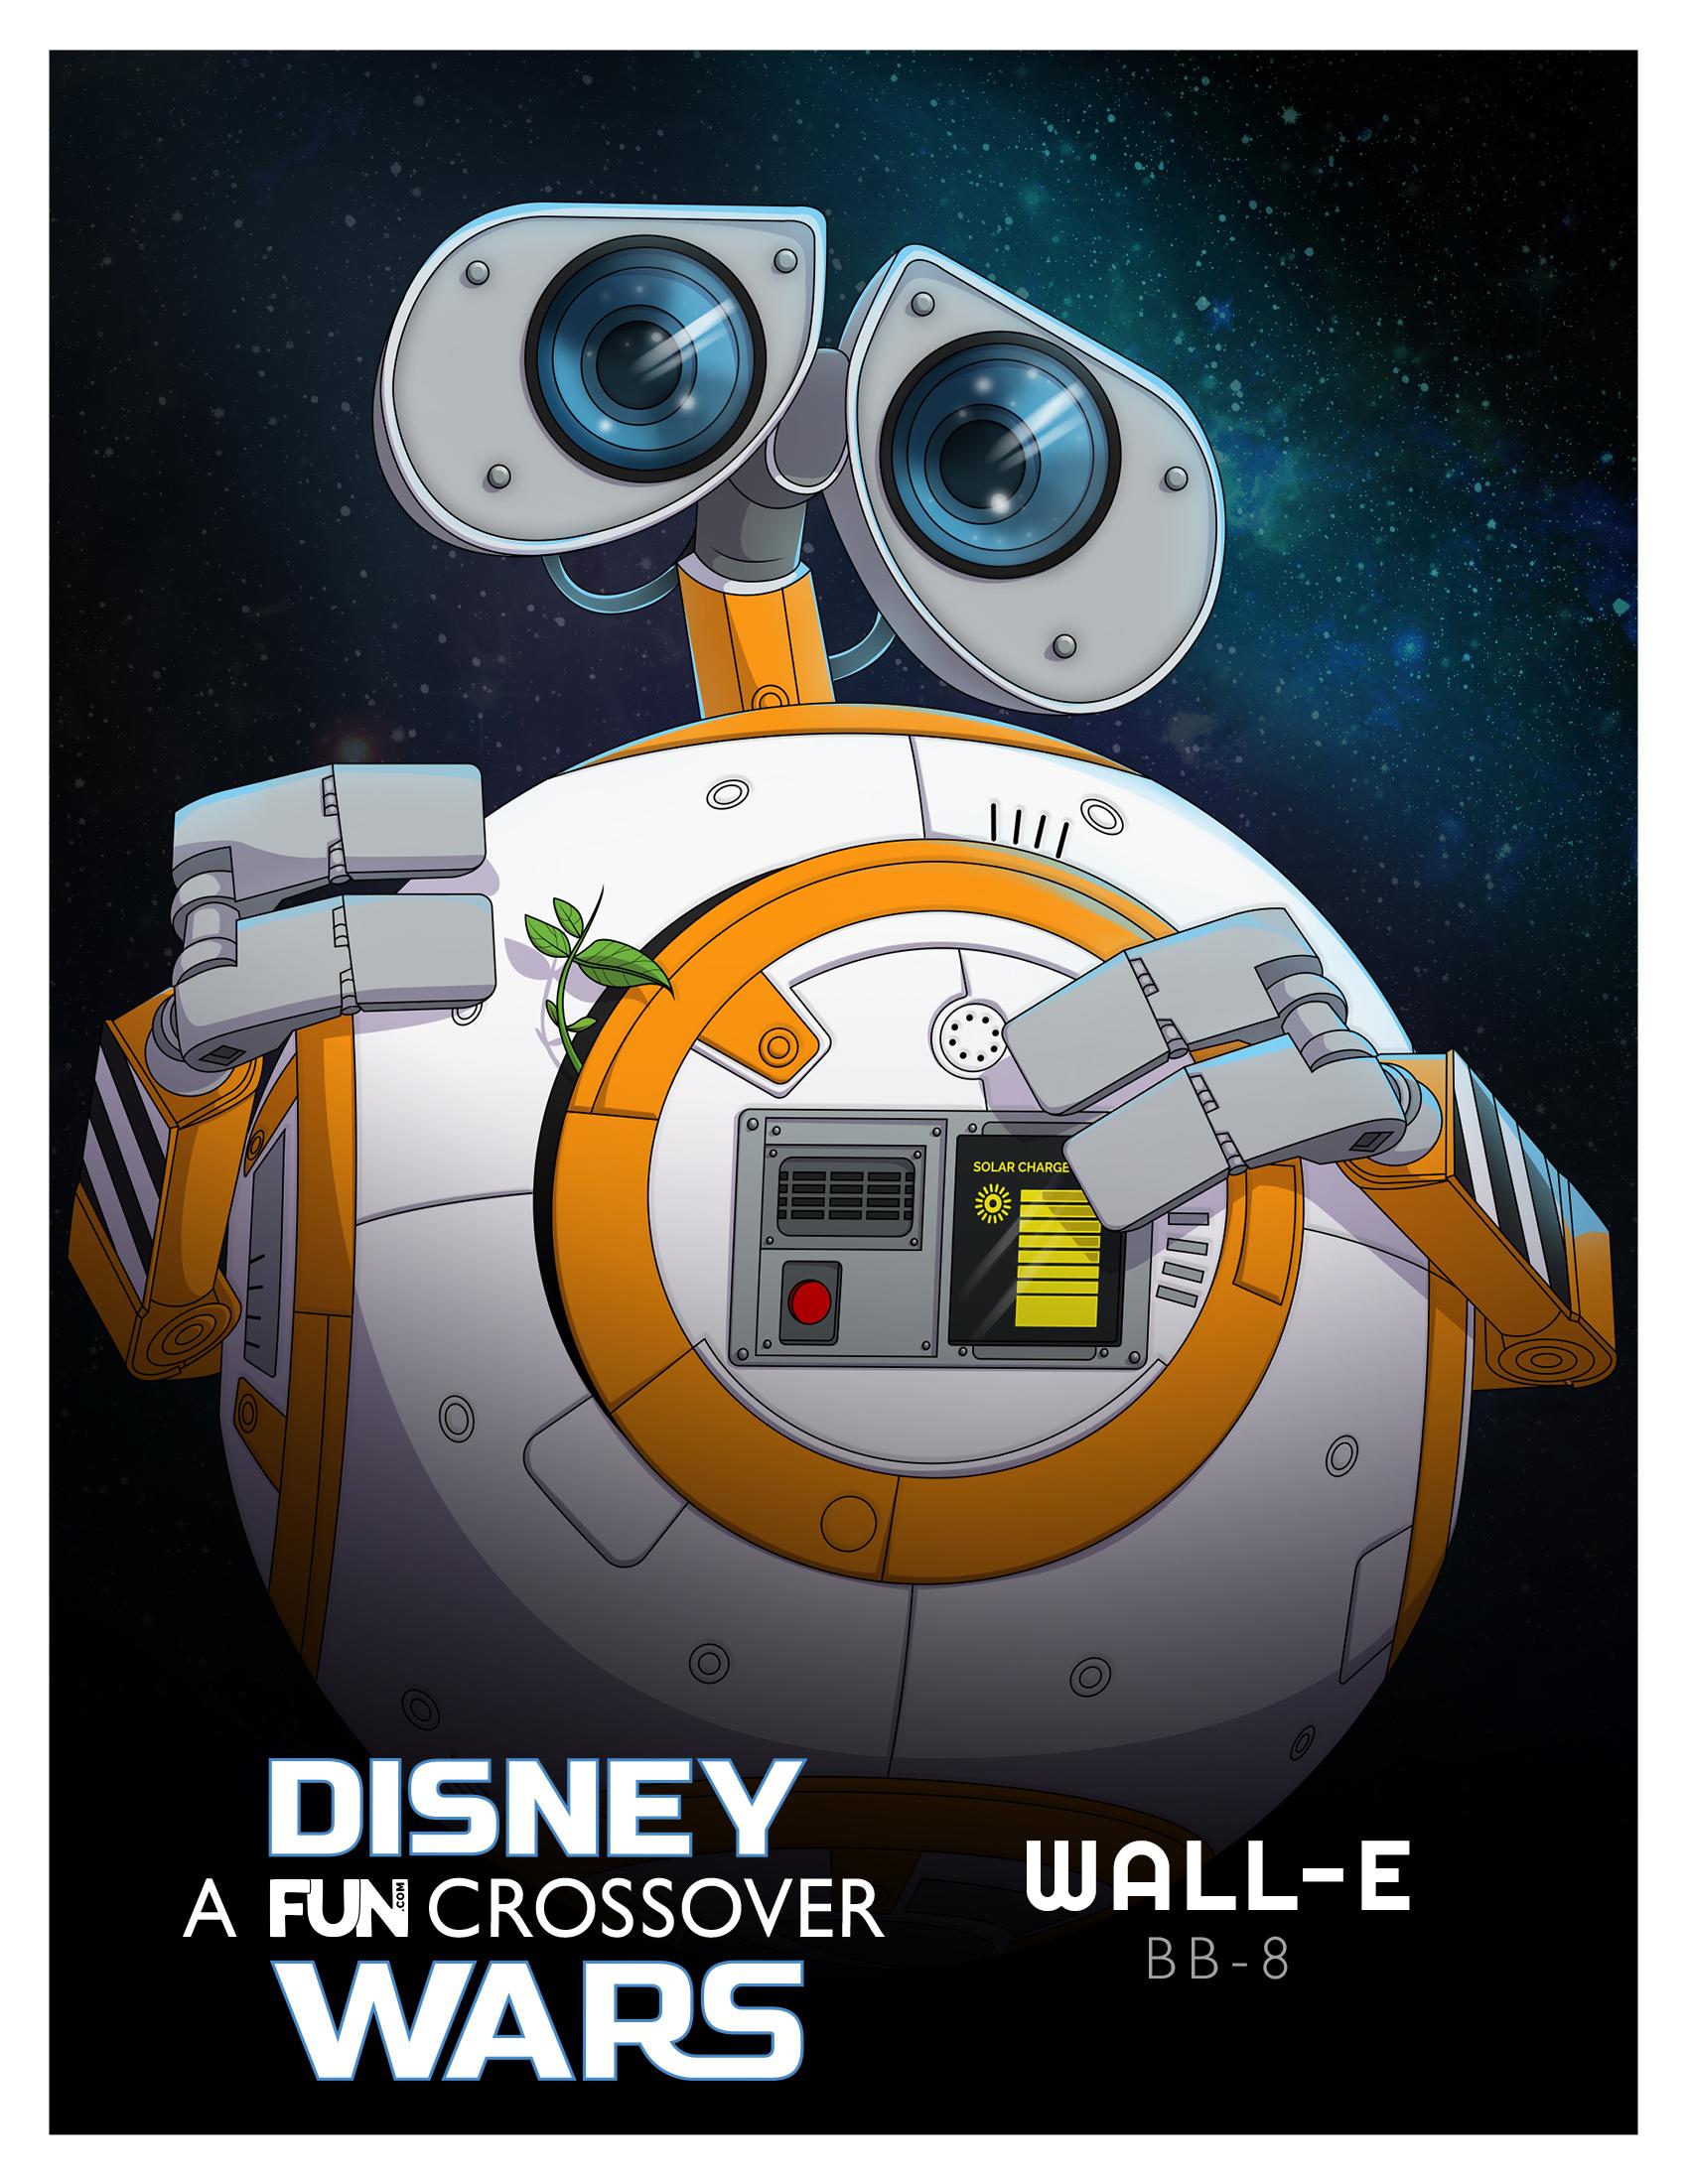 Disney Wars Wall-E BB-8